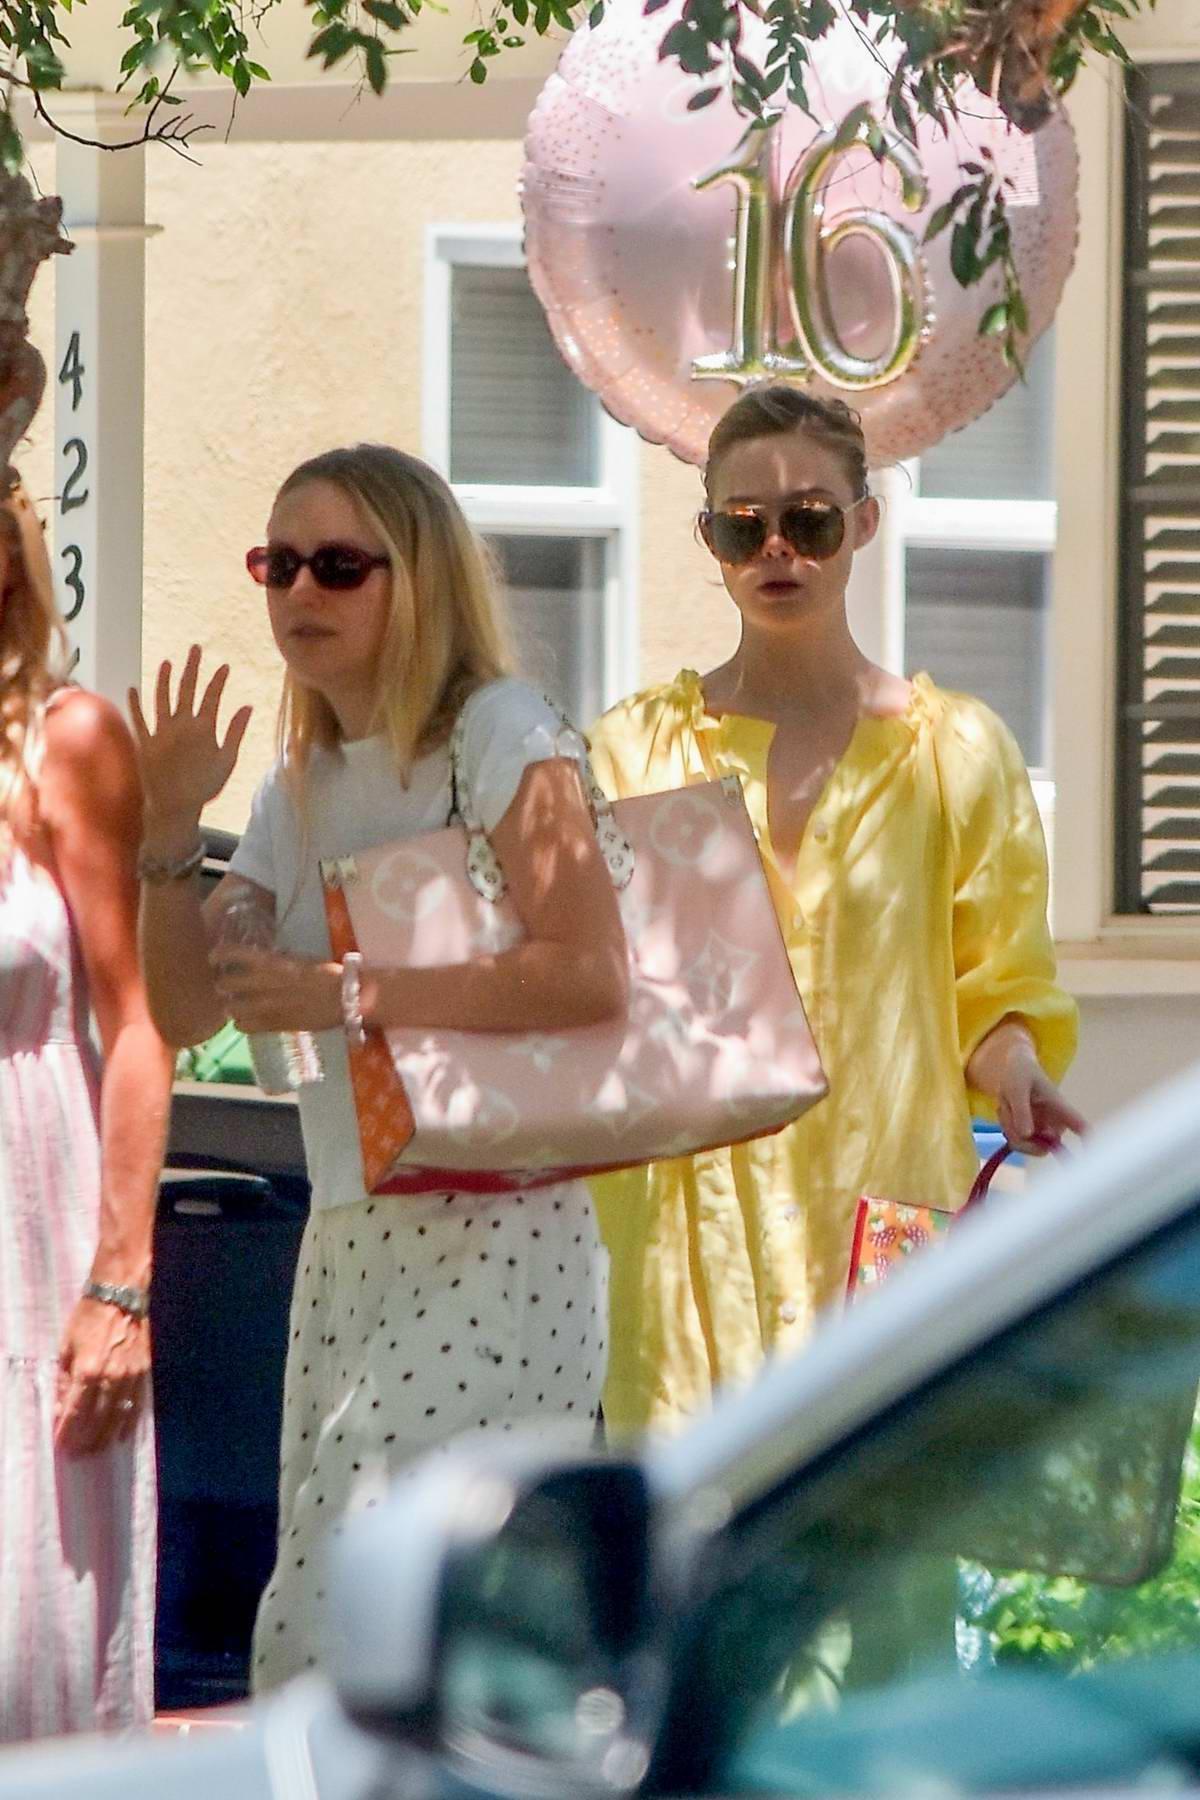 Elle Fanning and Dakota Fanning seen leaving a birthday party in Studio City, California